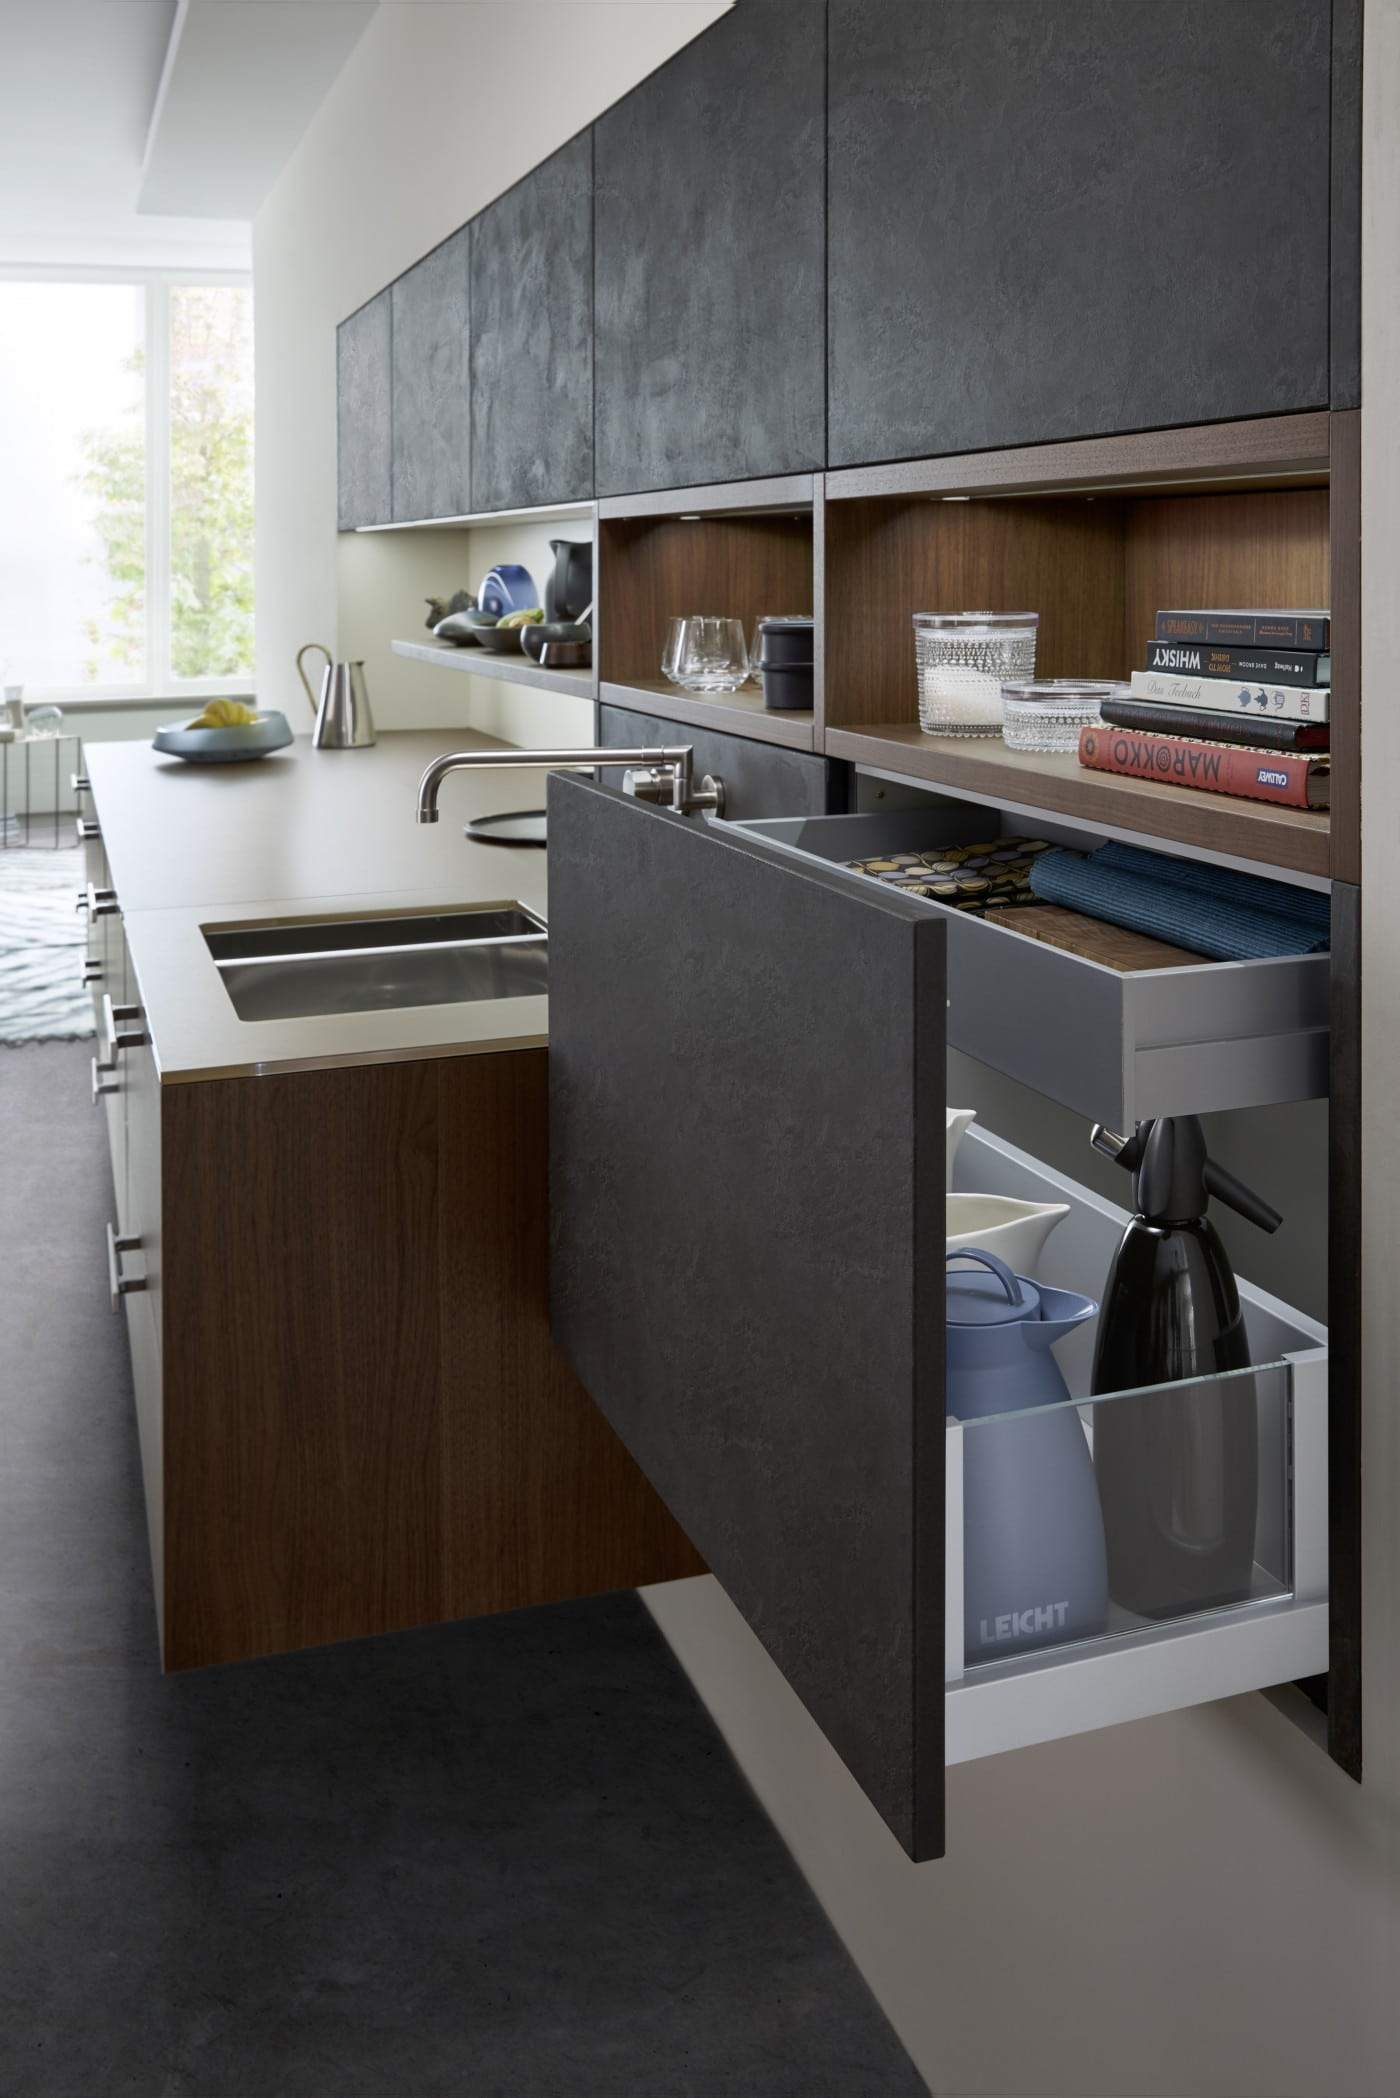 topos concrete kitchens kitchen showroom in fulham elan kitchens. Black Bedroom Furniture Sets. Home Design Ideas